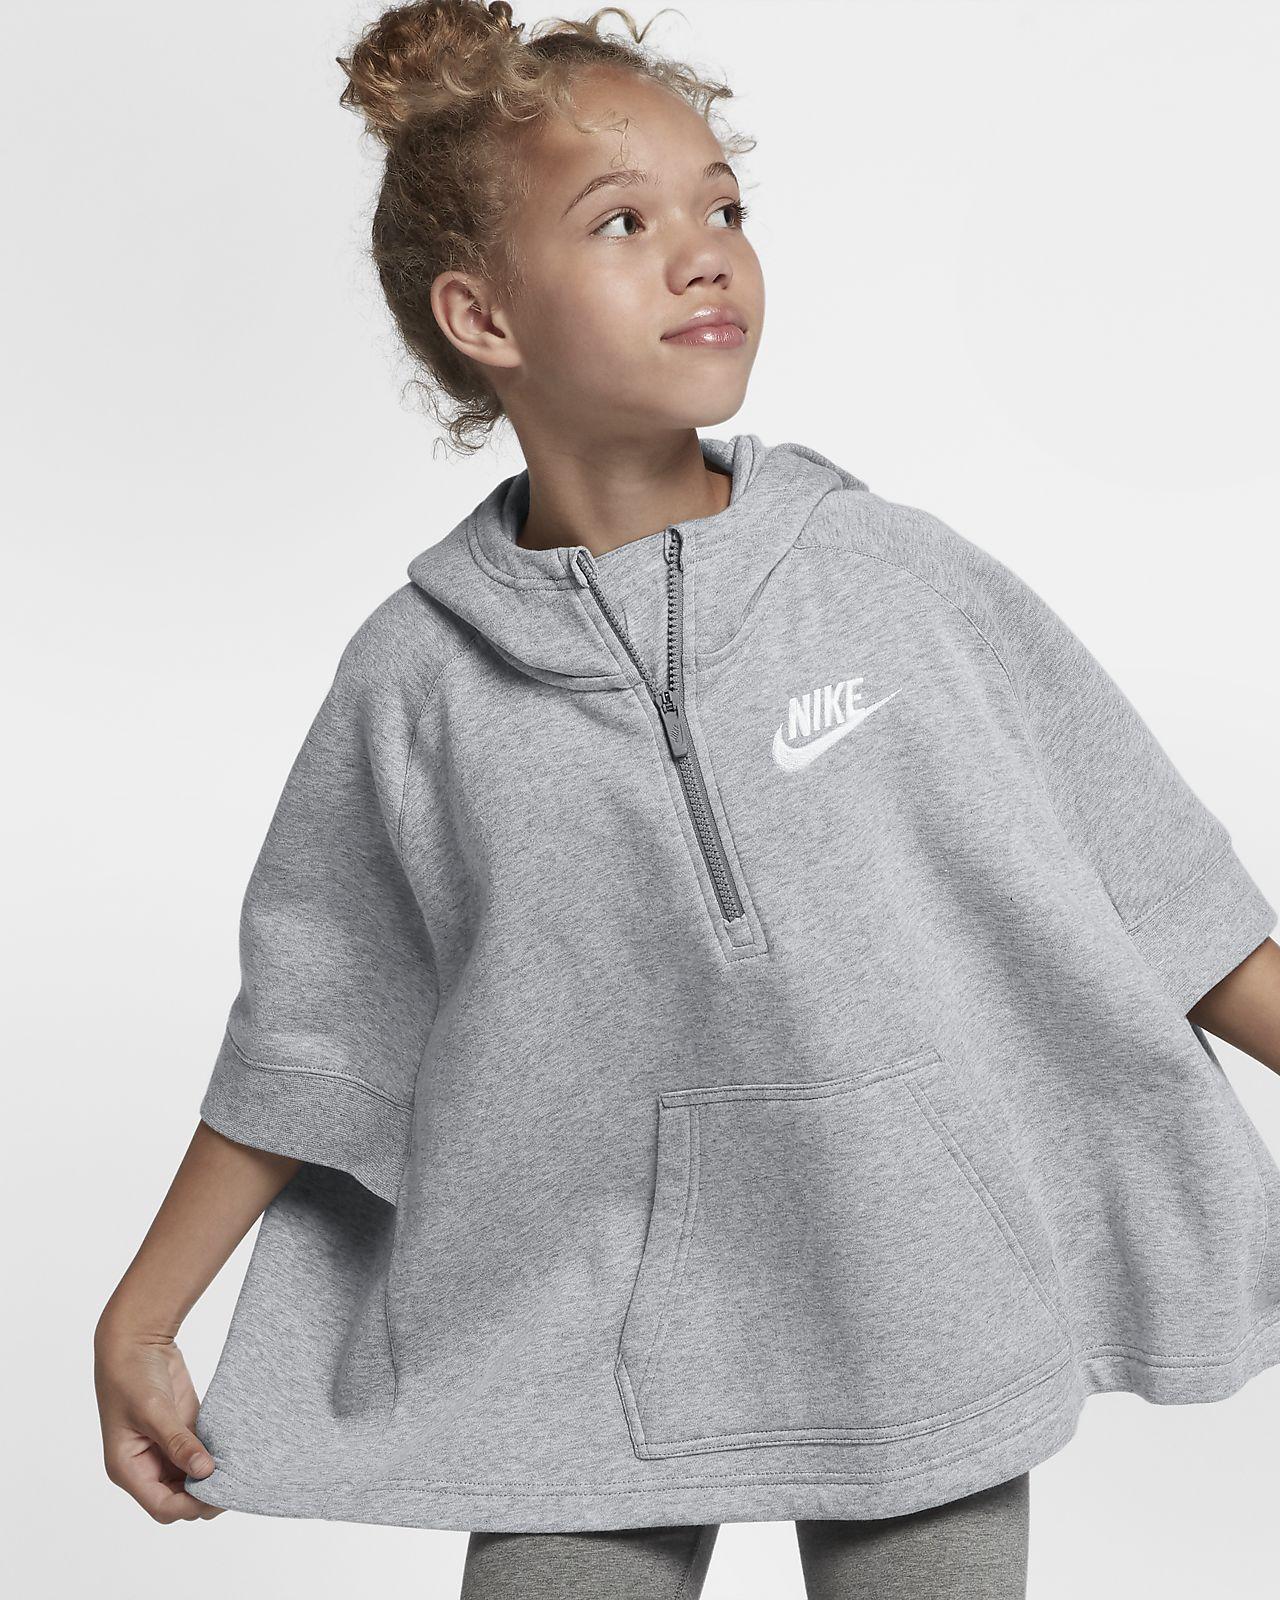 Nike Sportswear Big Kids' (Girls') Pullover Half-Zip Poncho. Nike.com